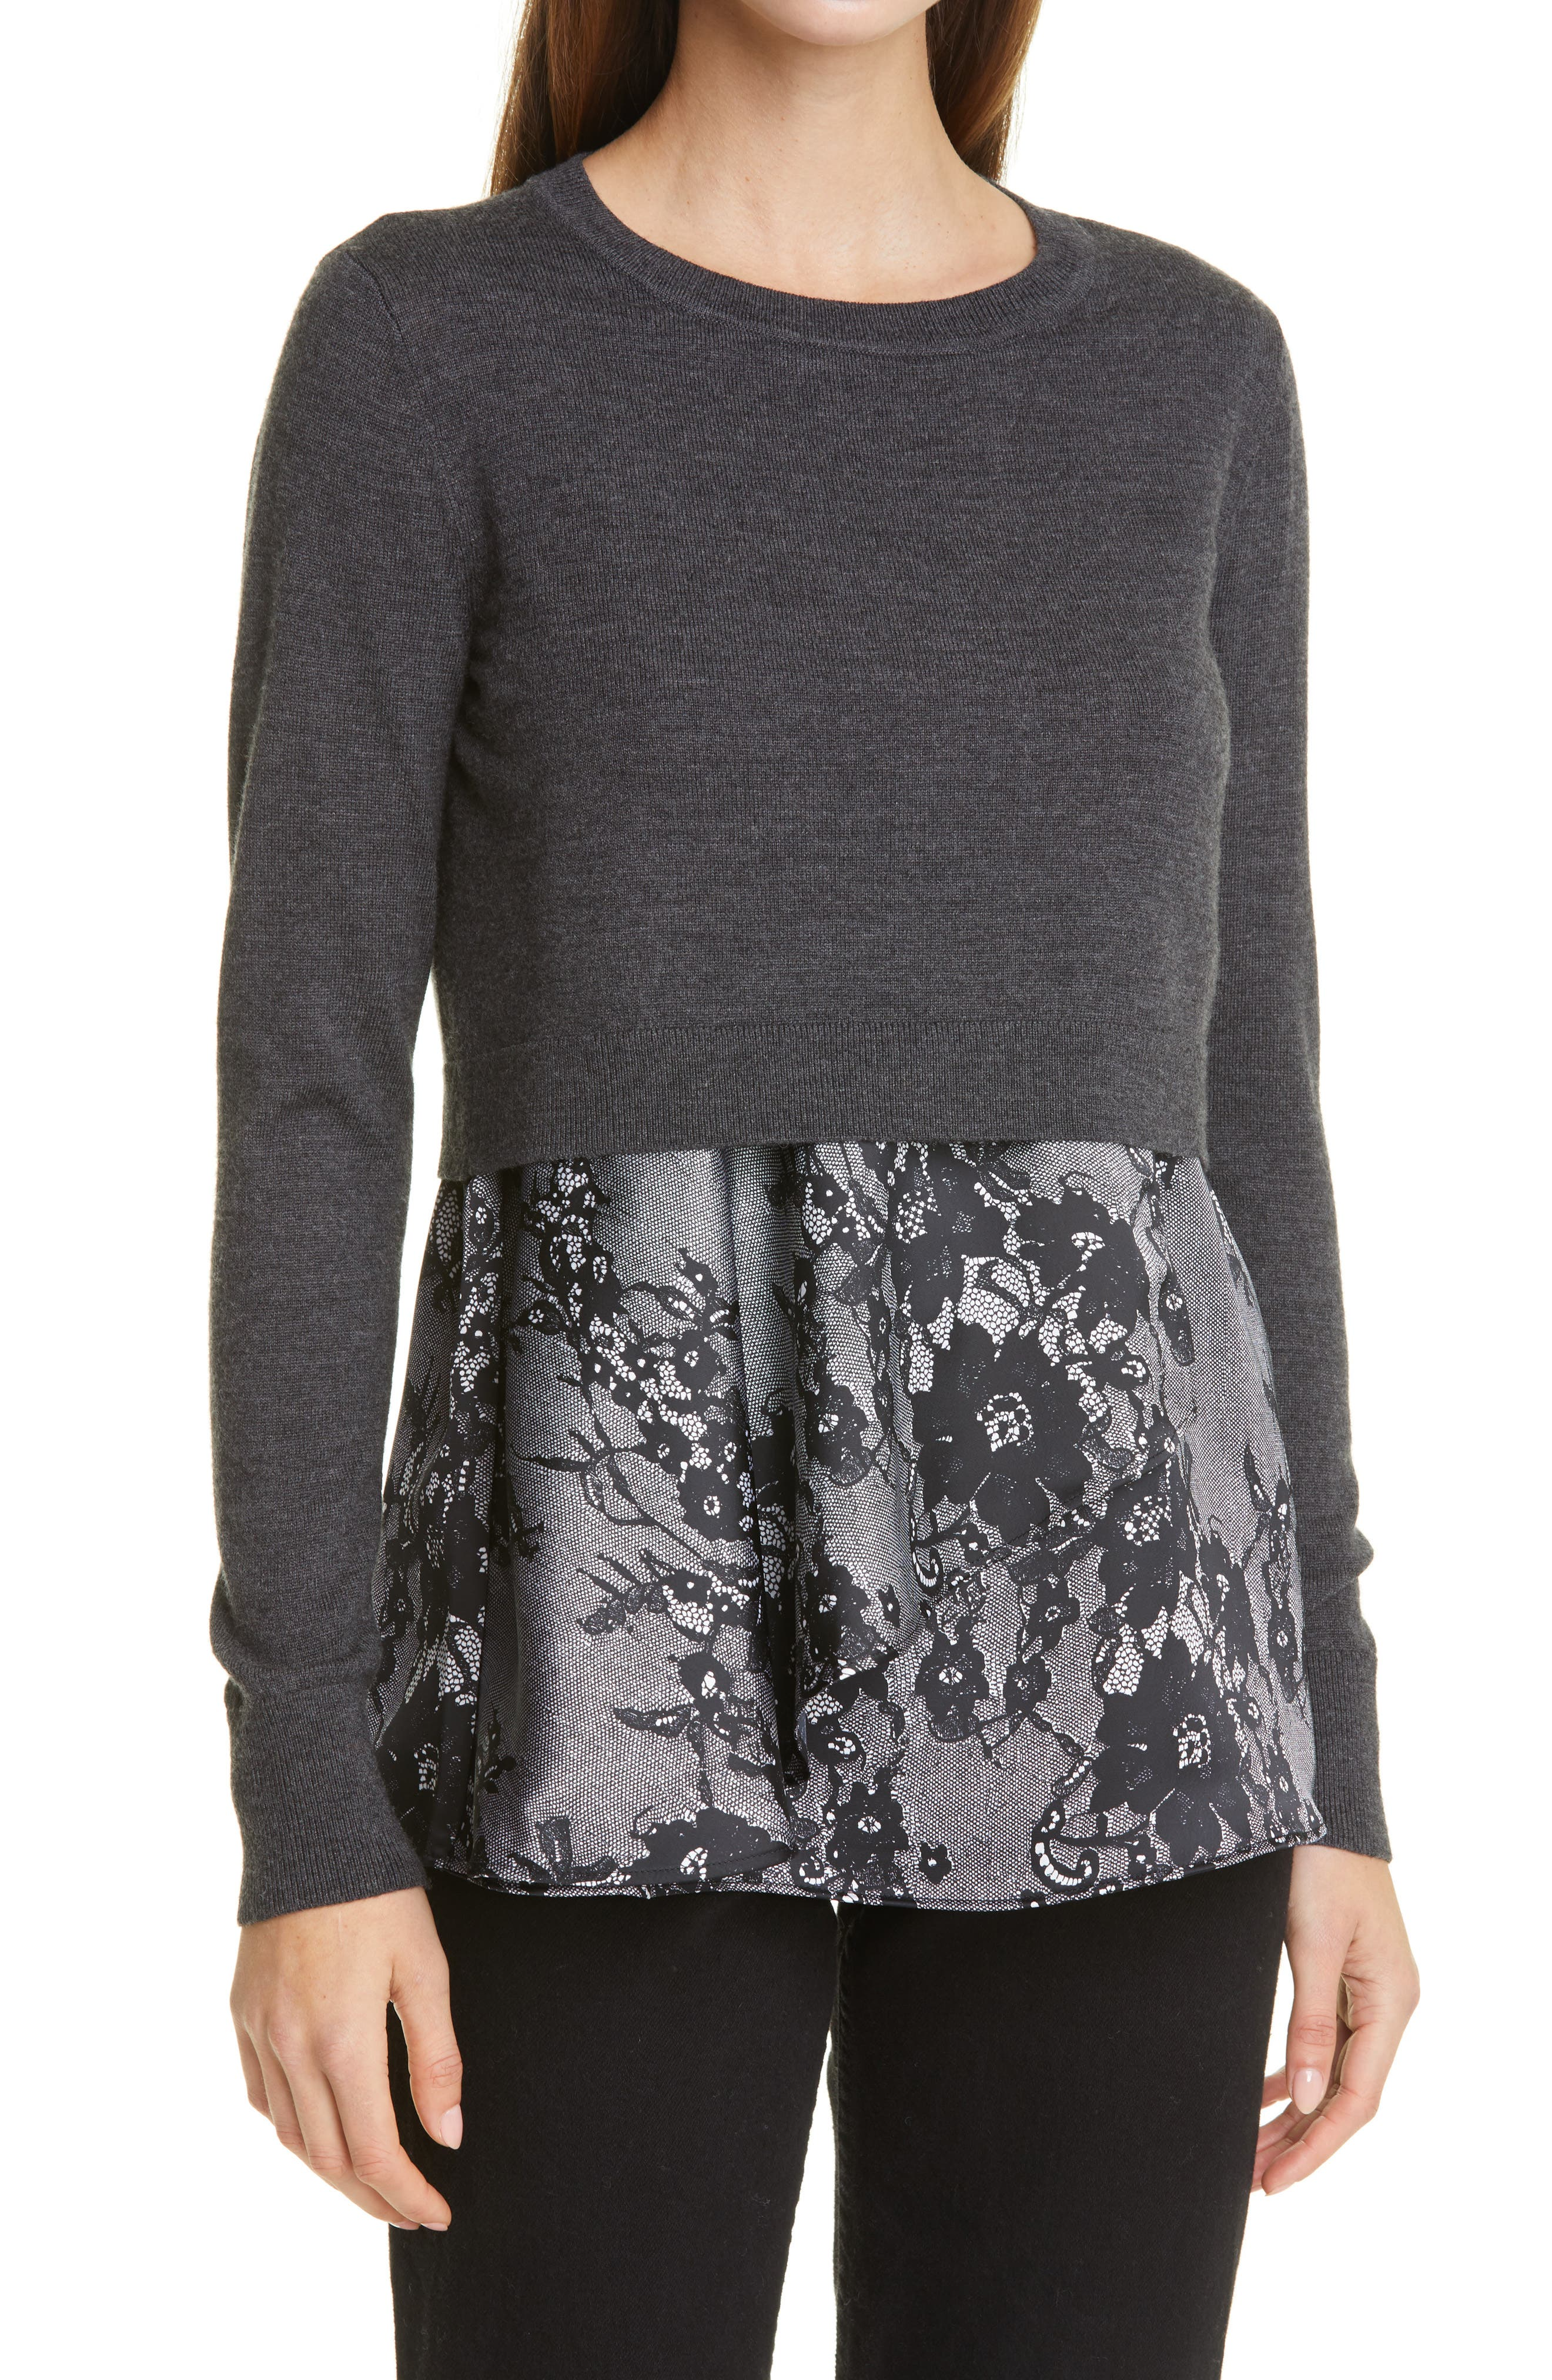 Club Monaco Claribel Layered Look Merino Wool Sweater   Nordstrom